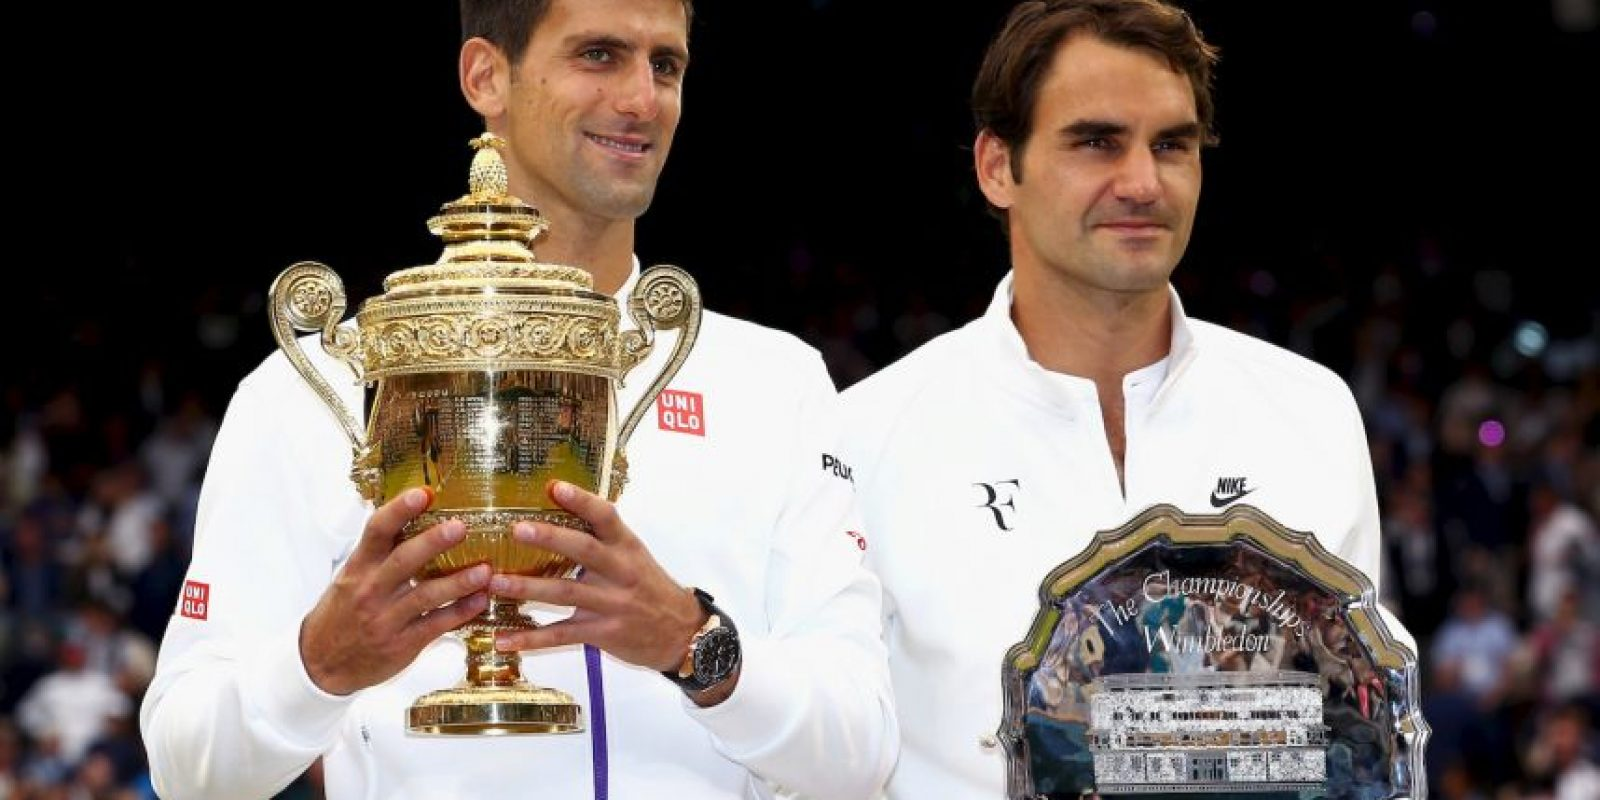 Ambos jugadores participaron en la final de Wimbledon este 12 de julio. Foto:Getty Images